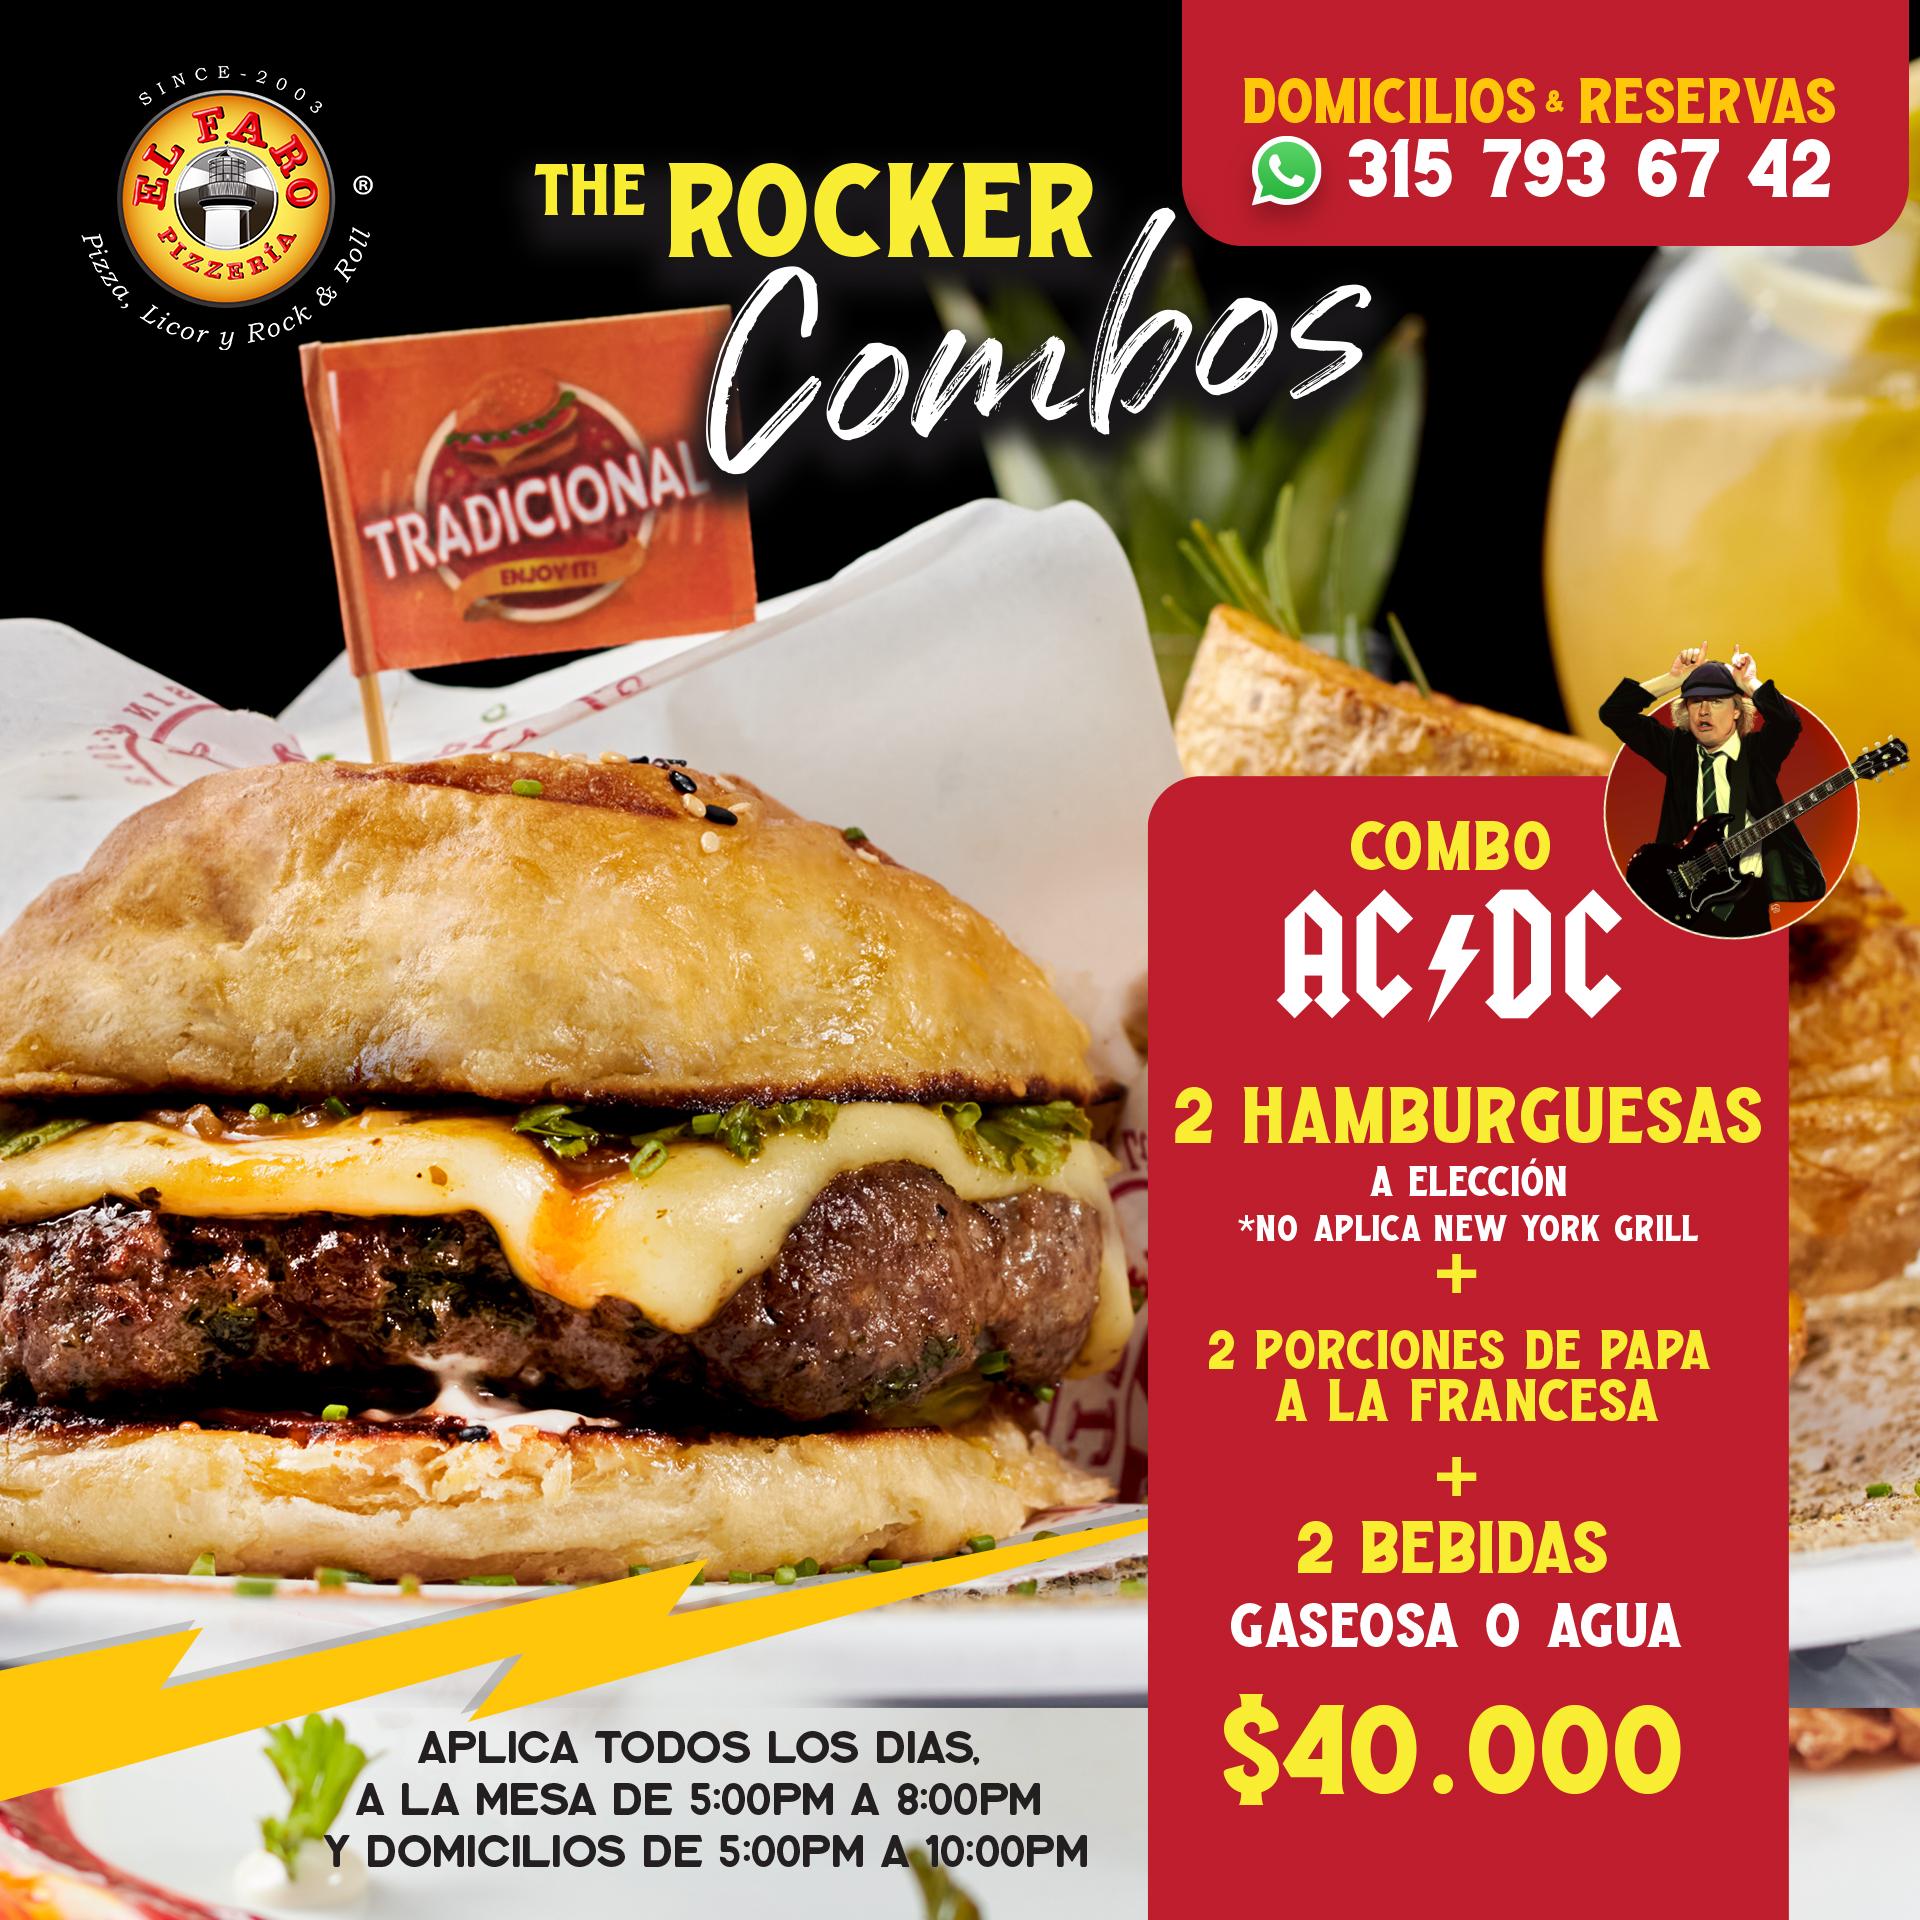 5--ROCKING-COMBO-AC-DC-SQ